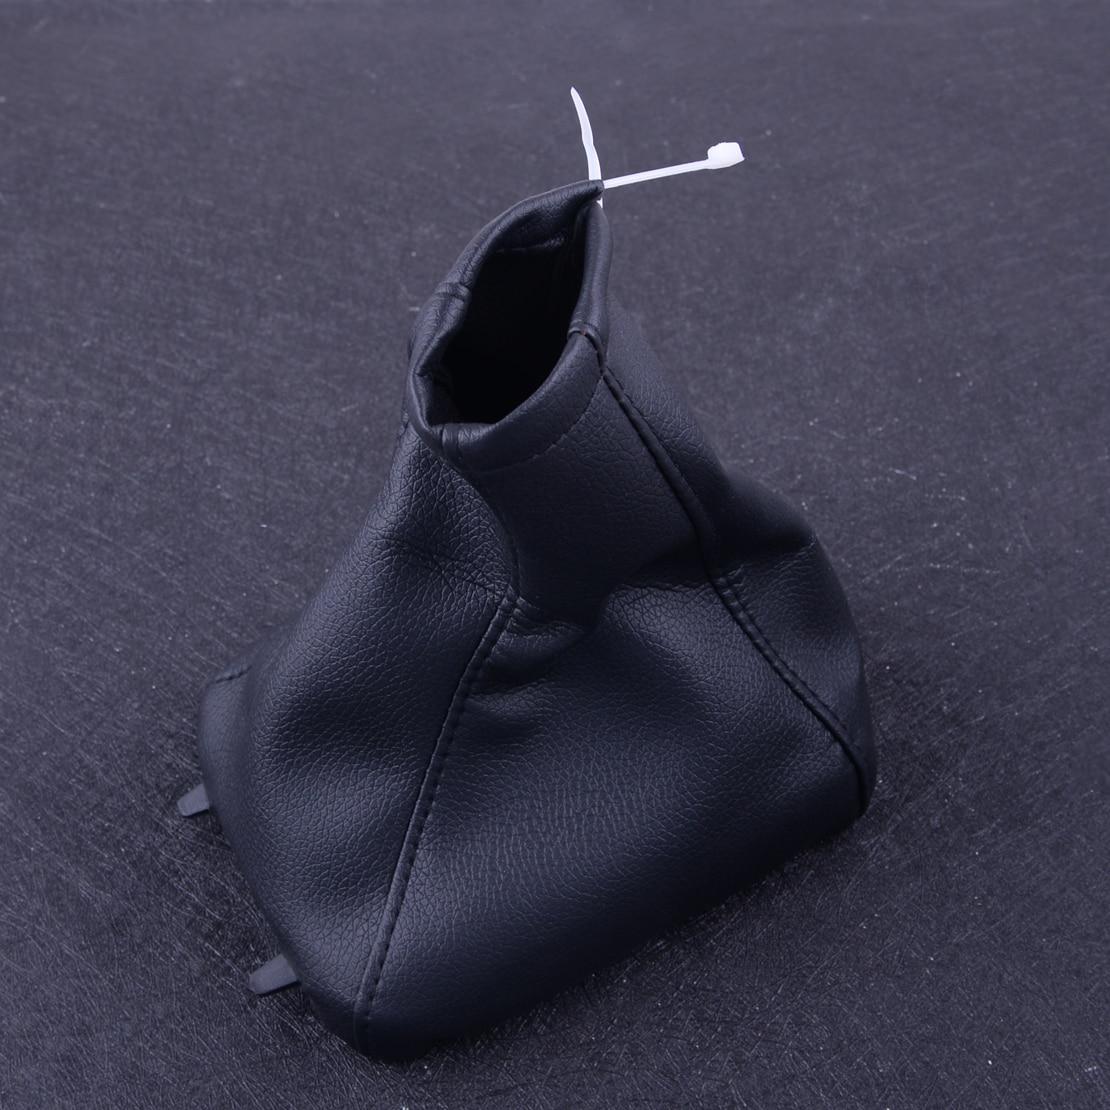 CITALL Car Gear Stick Gaiter Boot PU Leather Parking Handbrake Grips Cover Fit for Opel G Zafira A 1998 1999 2000 2001 2002-2004